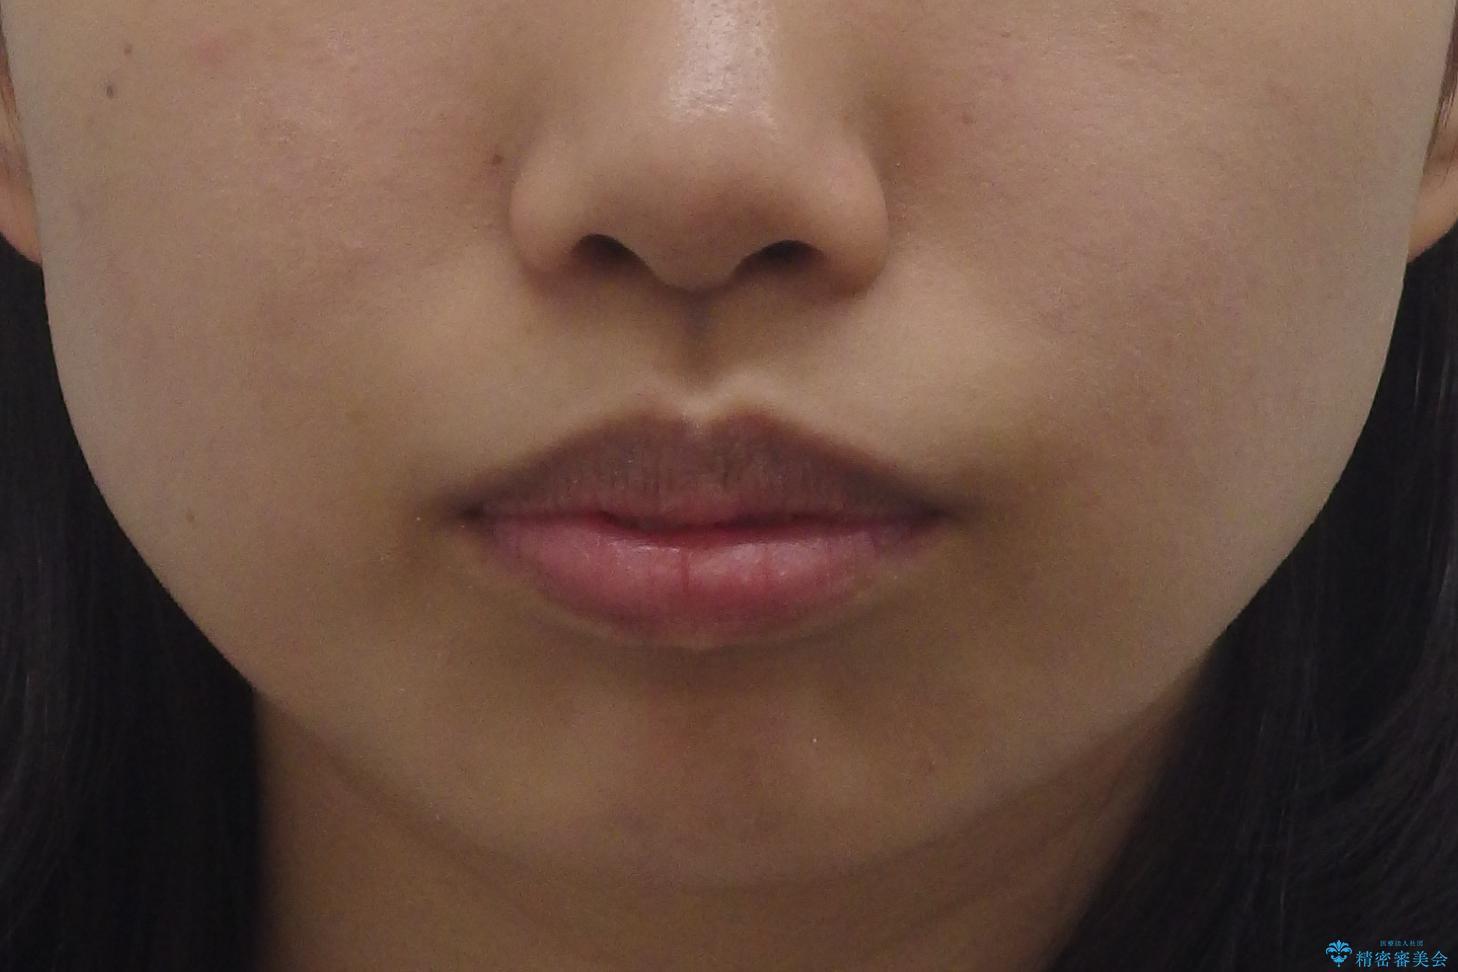 Eラインを整える治療 前歯を引っ込めますの治療前(顔貌)